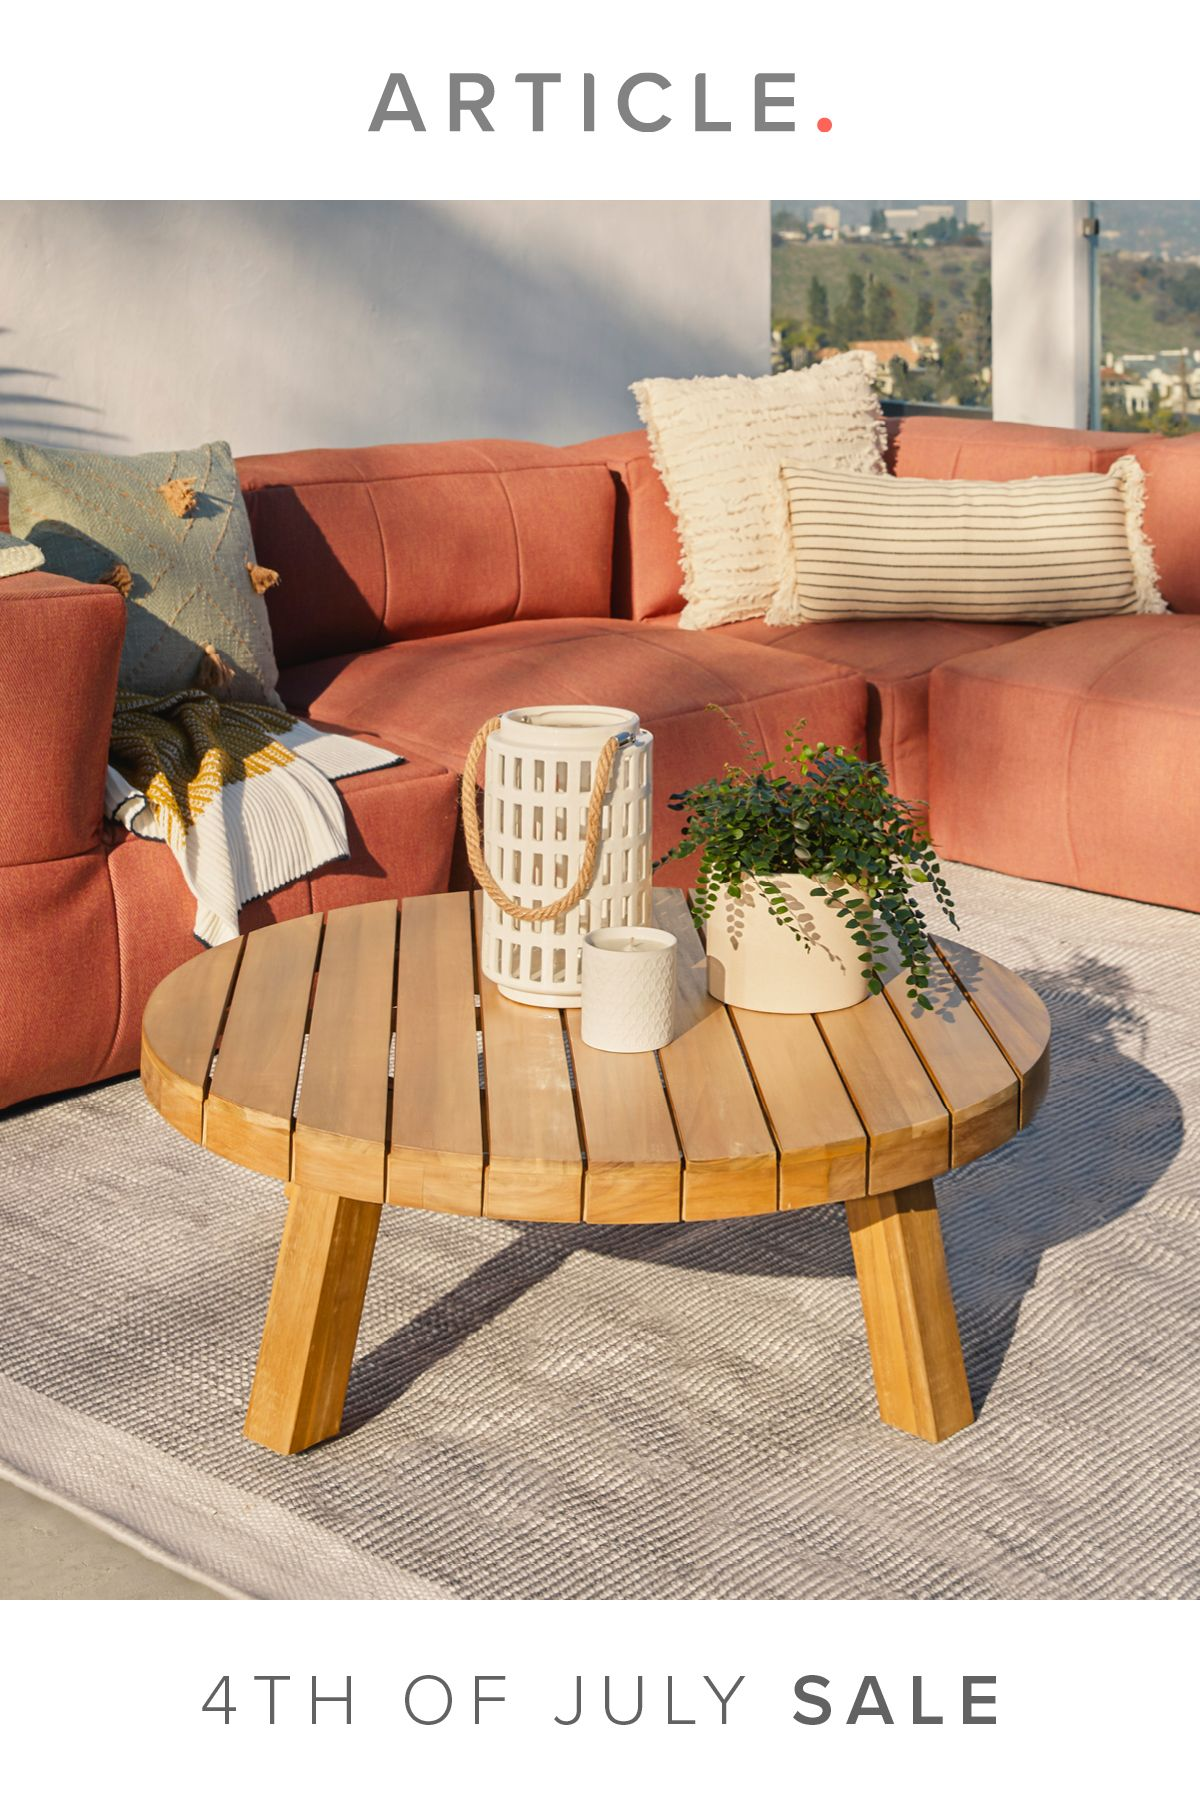 Koel Natural Wood Coffee Table Minimalist Home Interior Small Patio Decor Natural Wood Coffee Table [ 1800 x 1200 Pixel ]